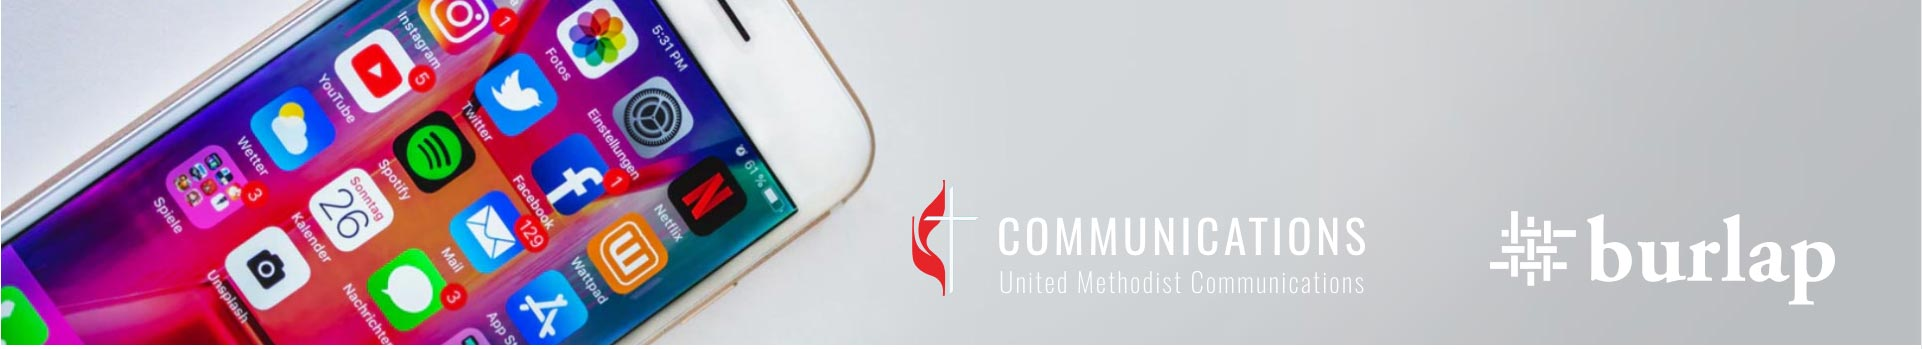 UMC Local Church services provides grants to local churches seeking to improve their social media marketing